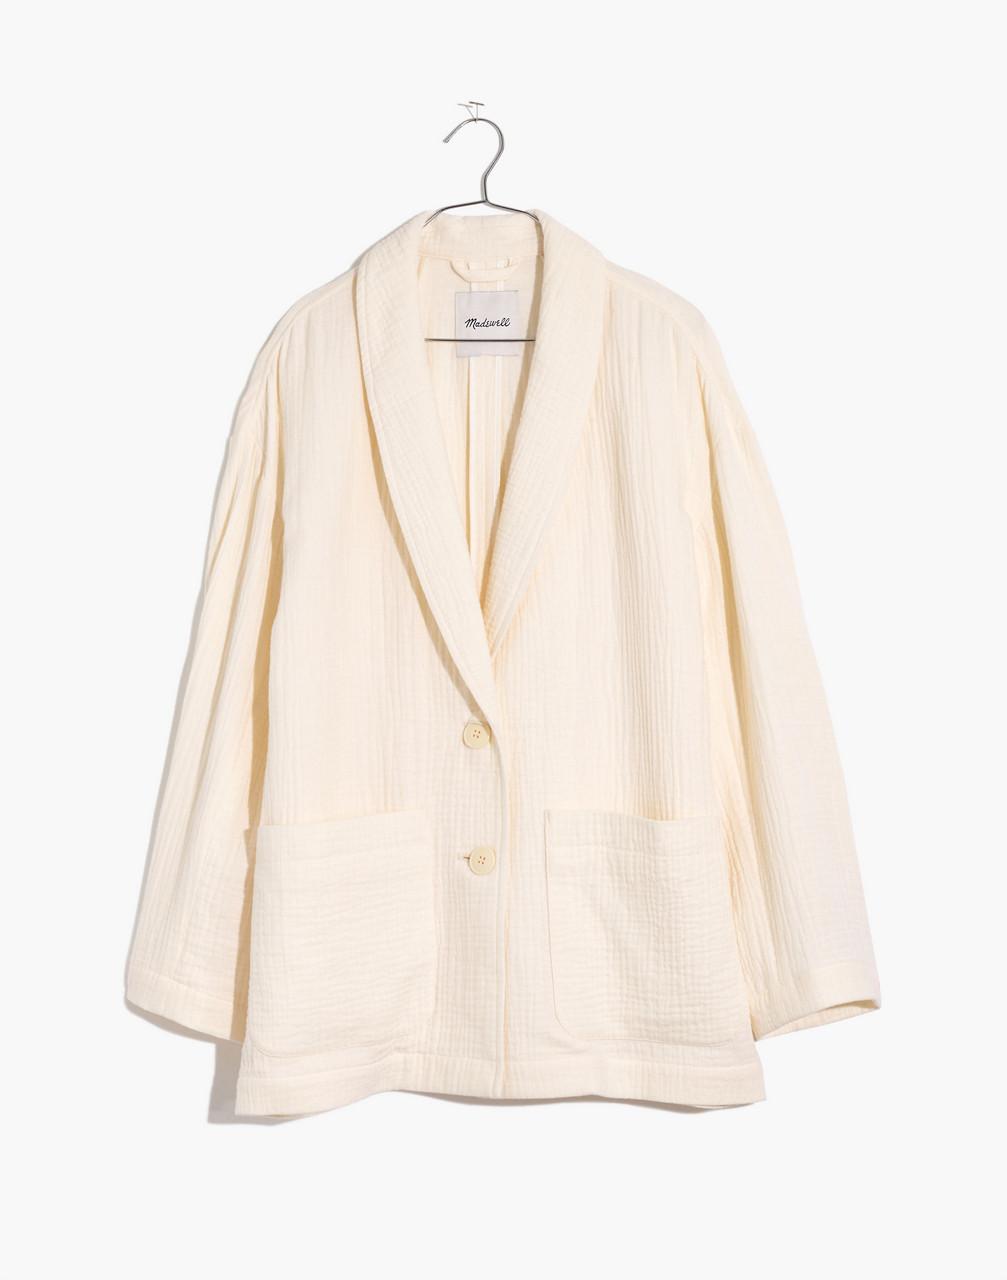 1920s Coats, Furs, Jackets and Capes History Plus Lightspun Dorset Blazer $138.00 AT vintagedancer.com